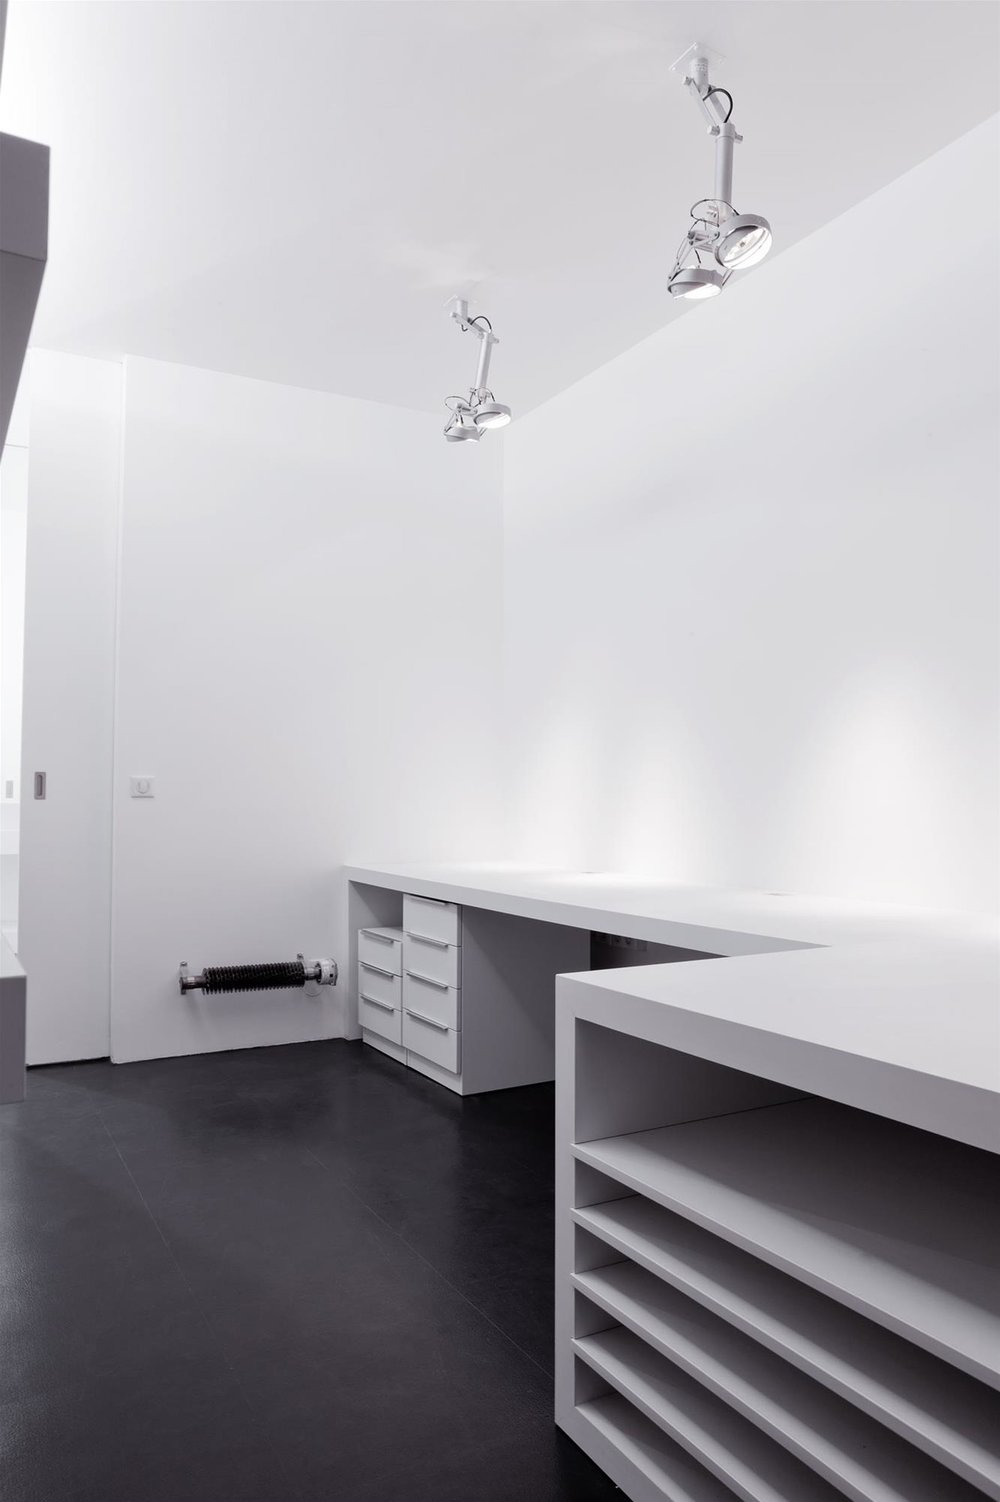 atelier_stefan_lubrina_interior_bureaux_lumineux.jpg